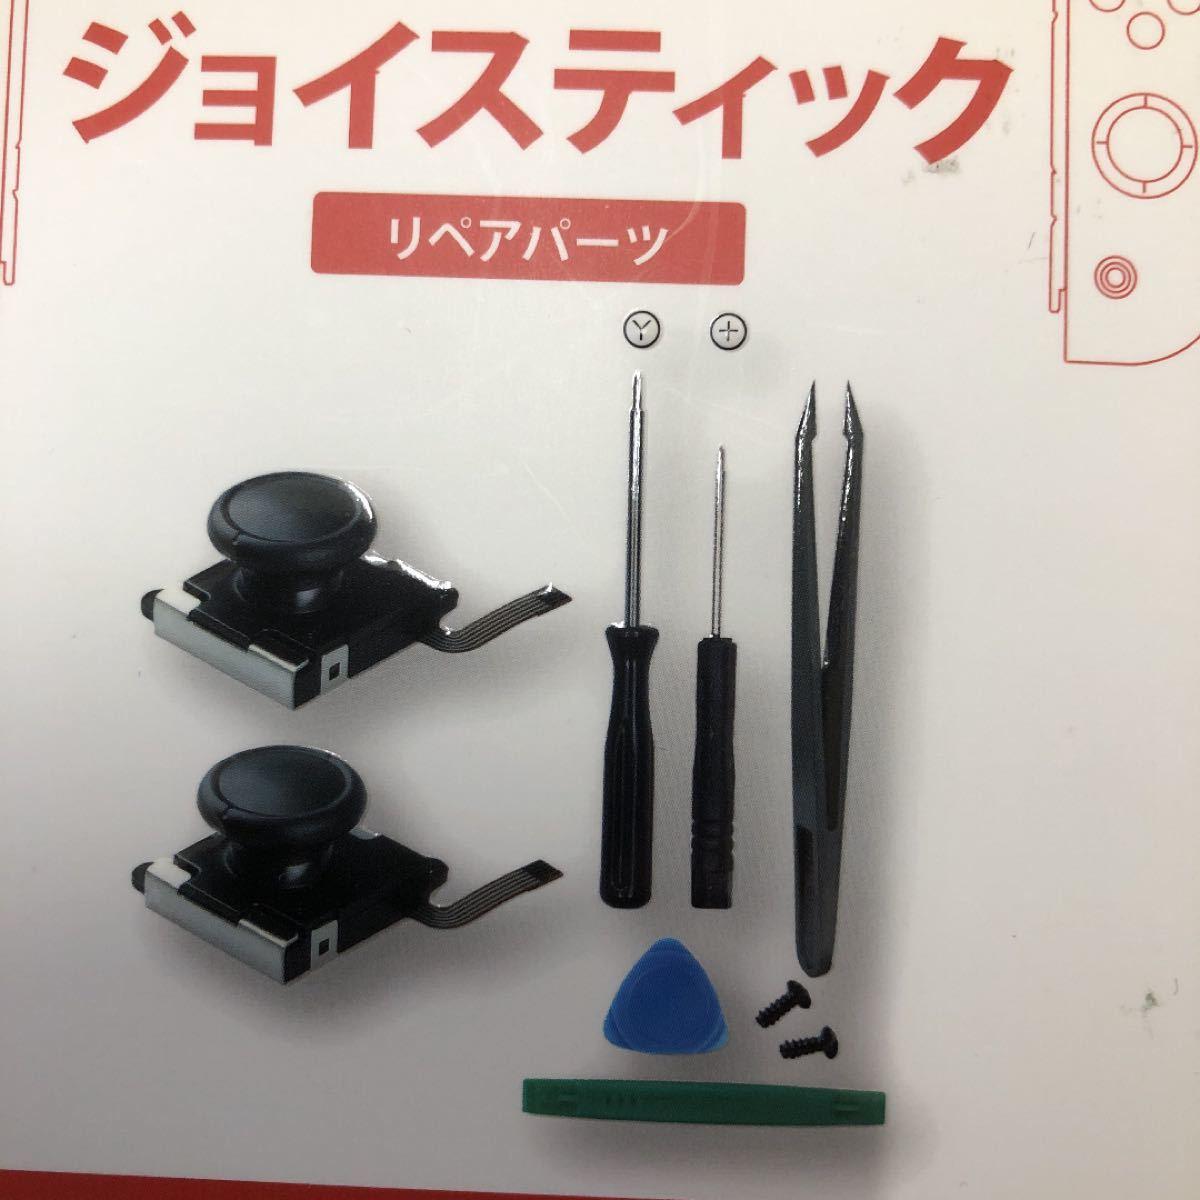 Nintendo Switch コントローラー ジョイスティック 修理キット